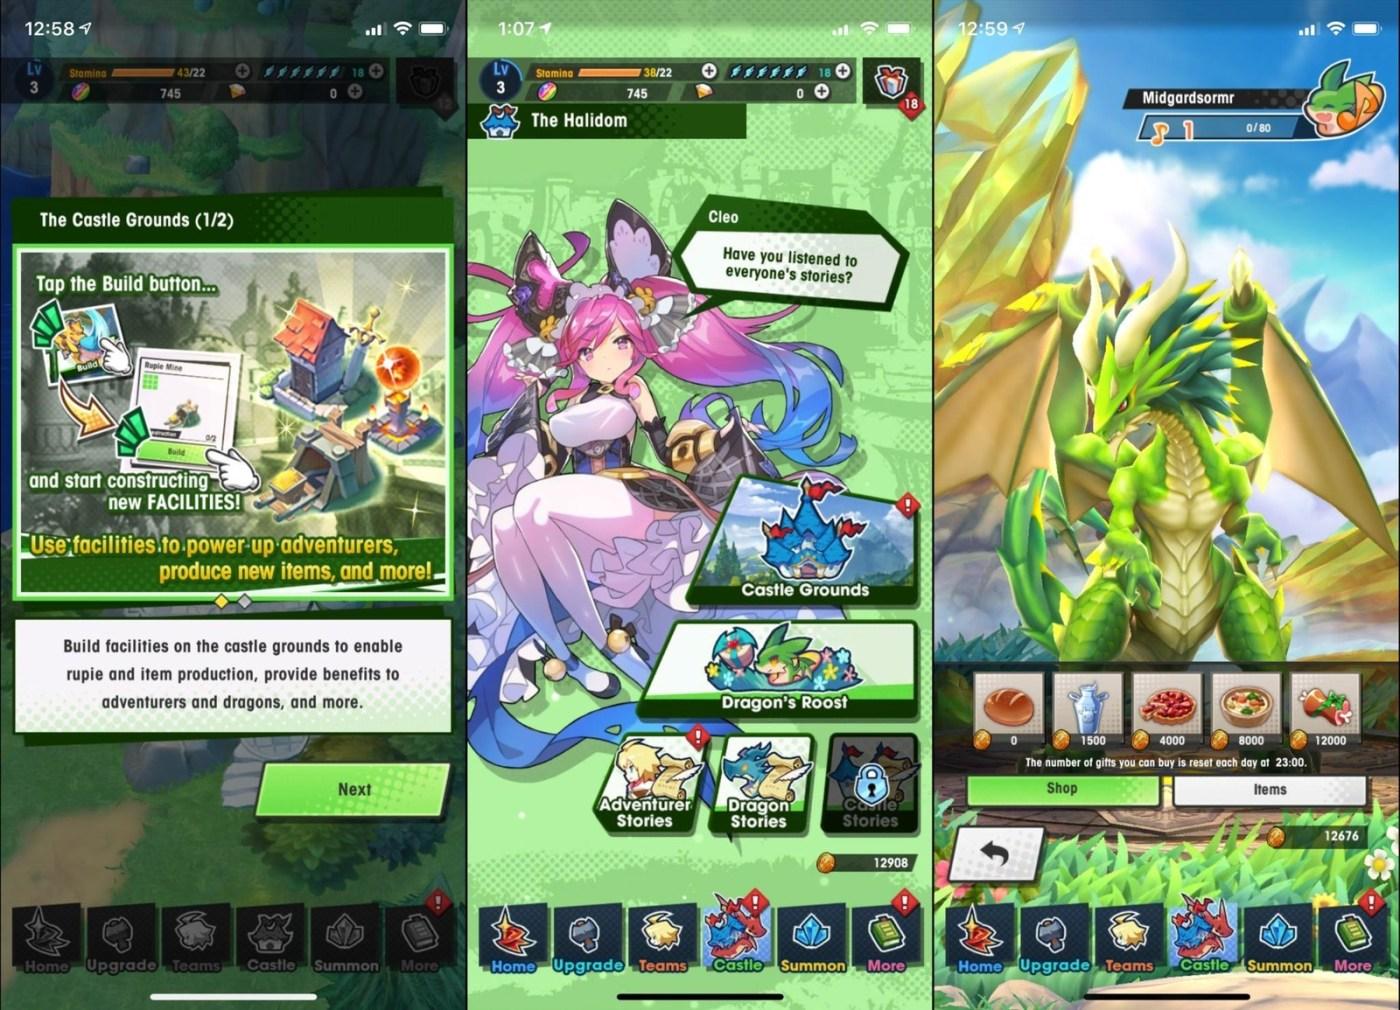 dragalia lost iphone xs castle grounds - Dragalia Lost MOD APK 1.16.2 (Damage x10)